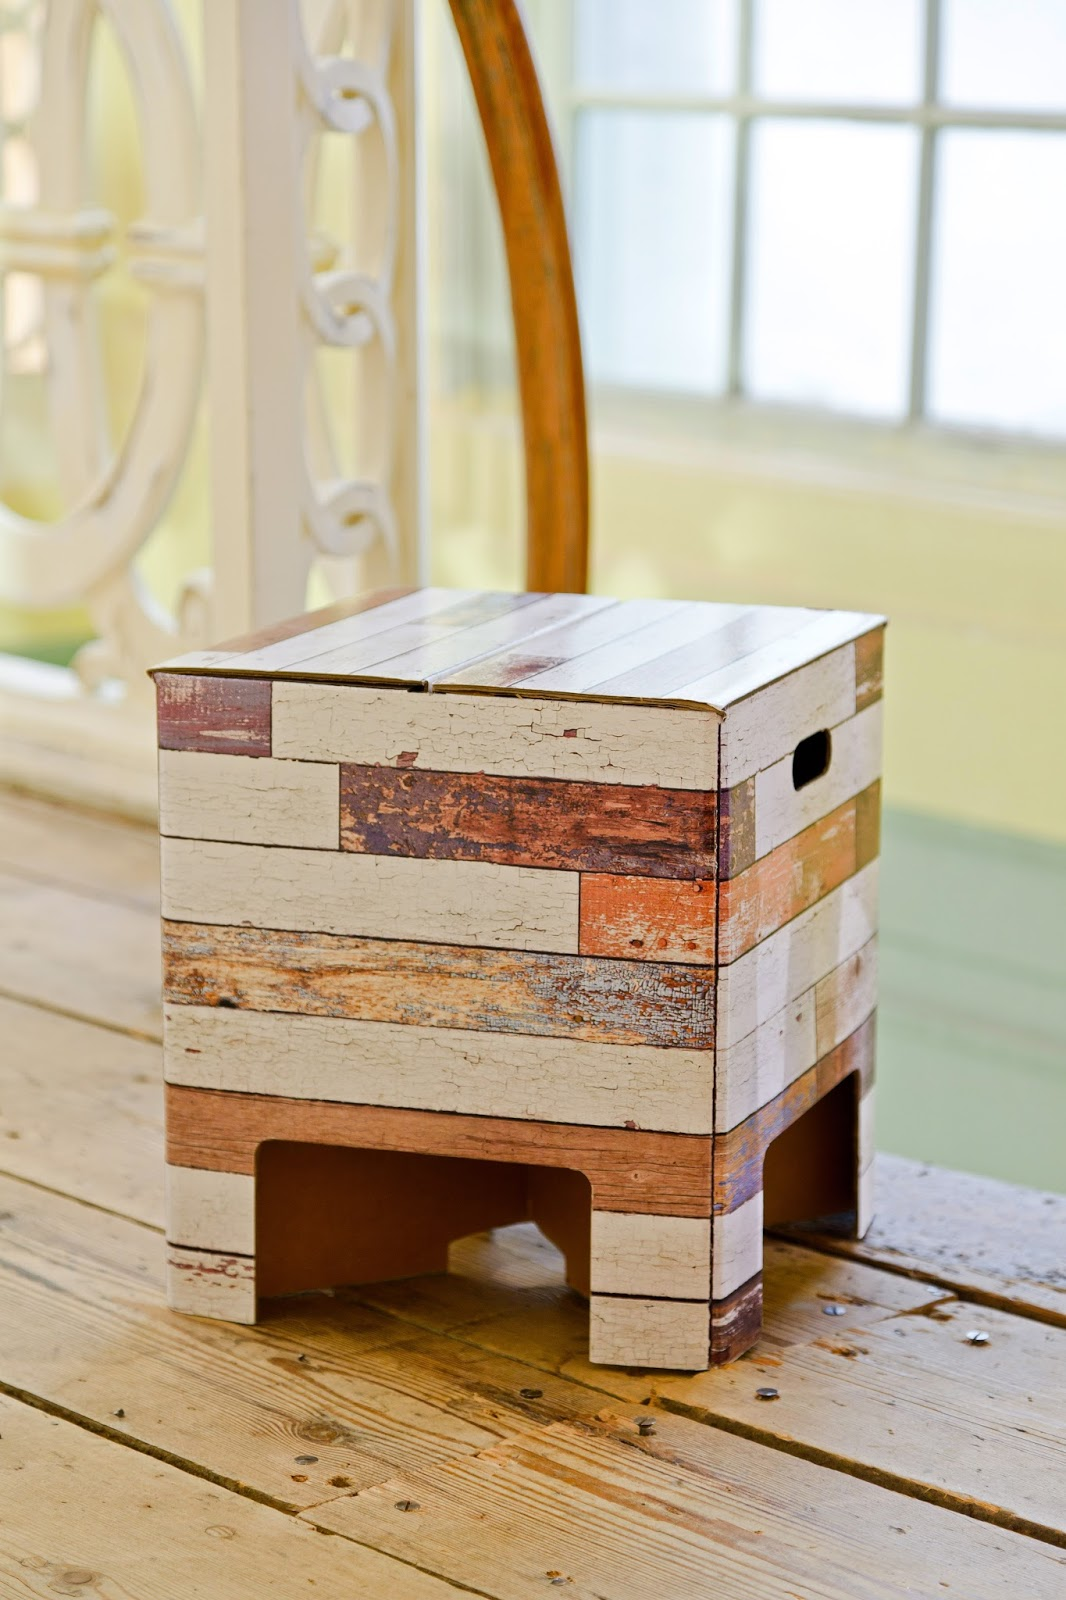 Furniture made of cardboard - a revolution in interior design 38